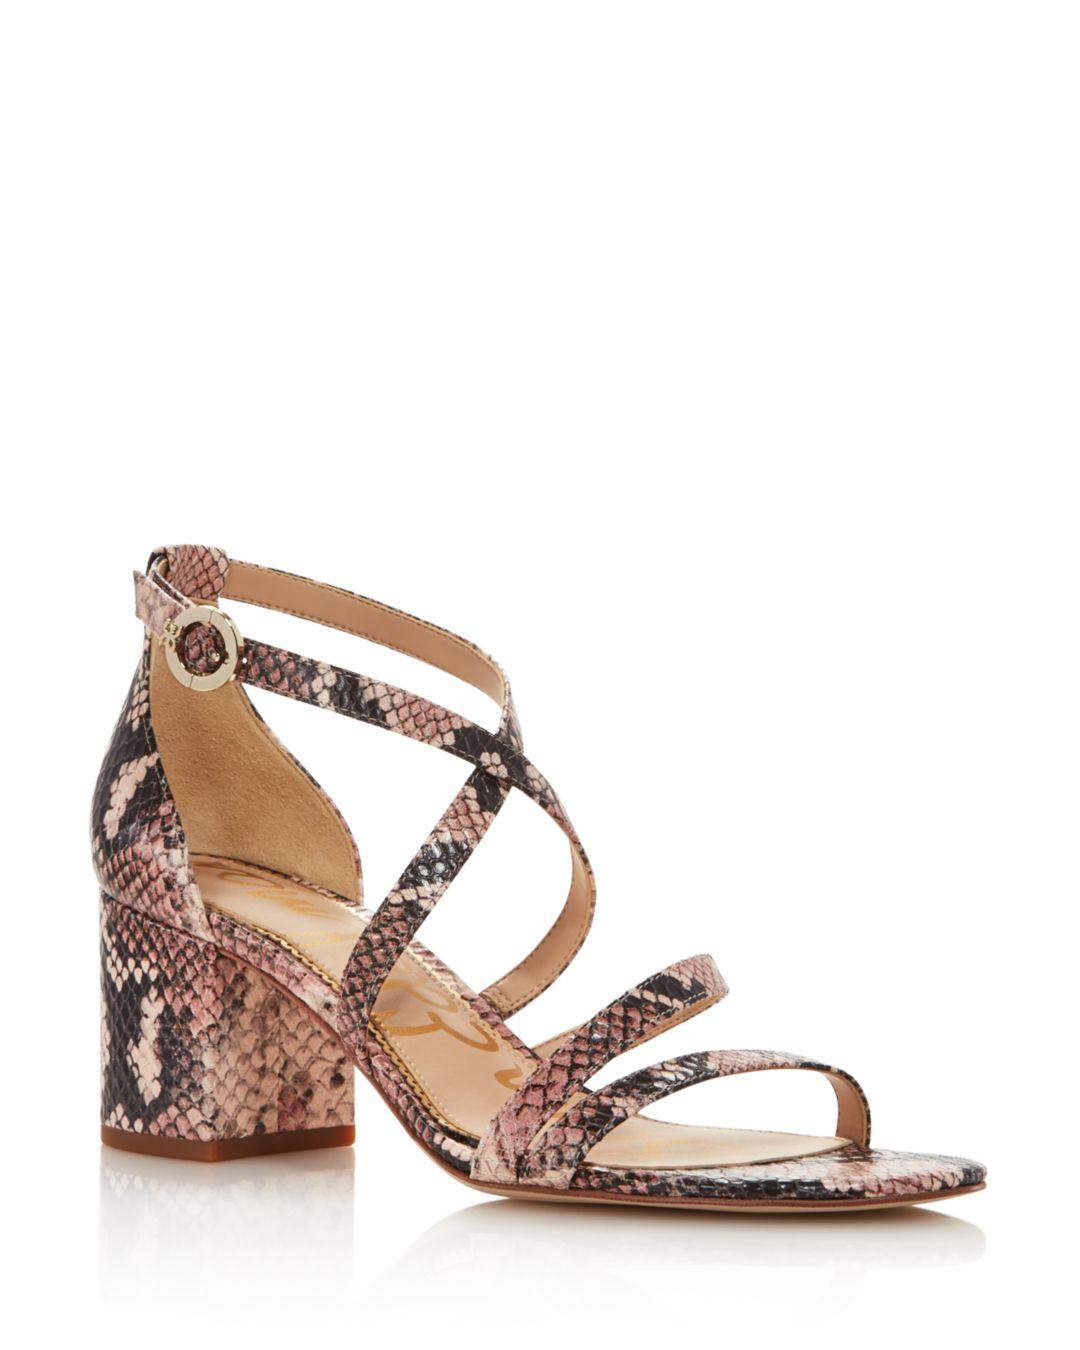 378a80678 Sam Edelman Women s Stacie Embossed-leather Block-heel Sandals - Lyst